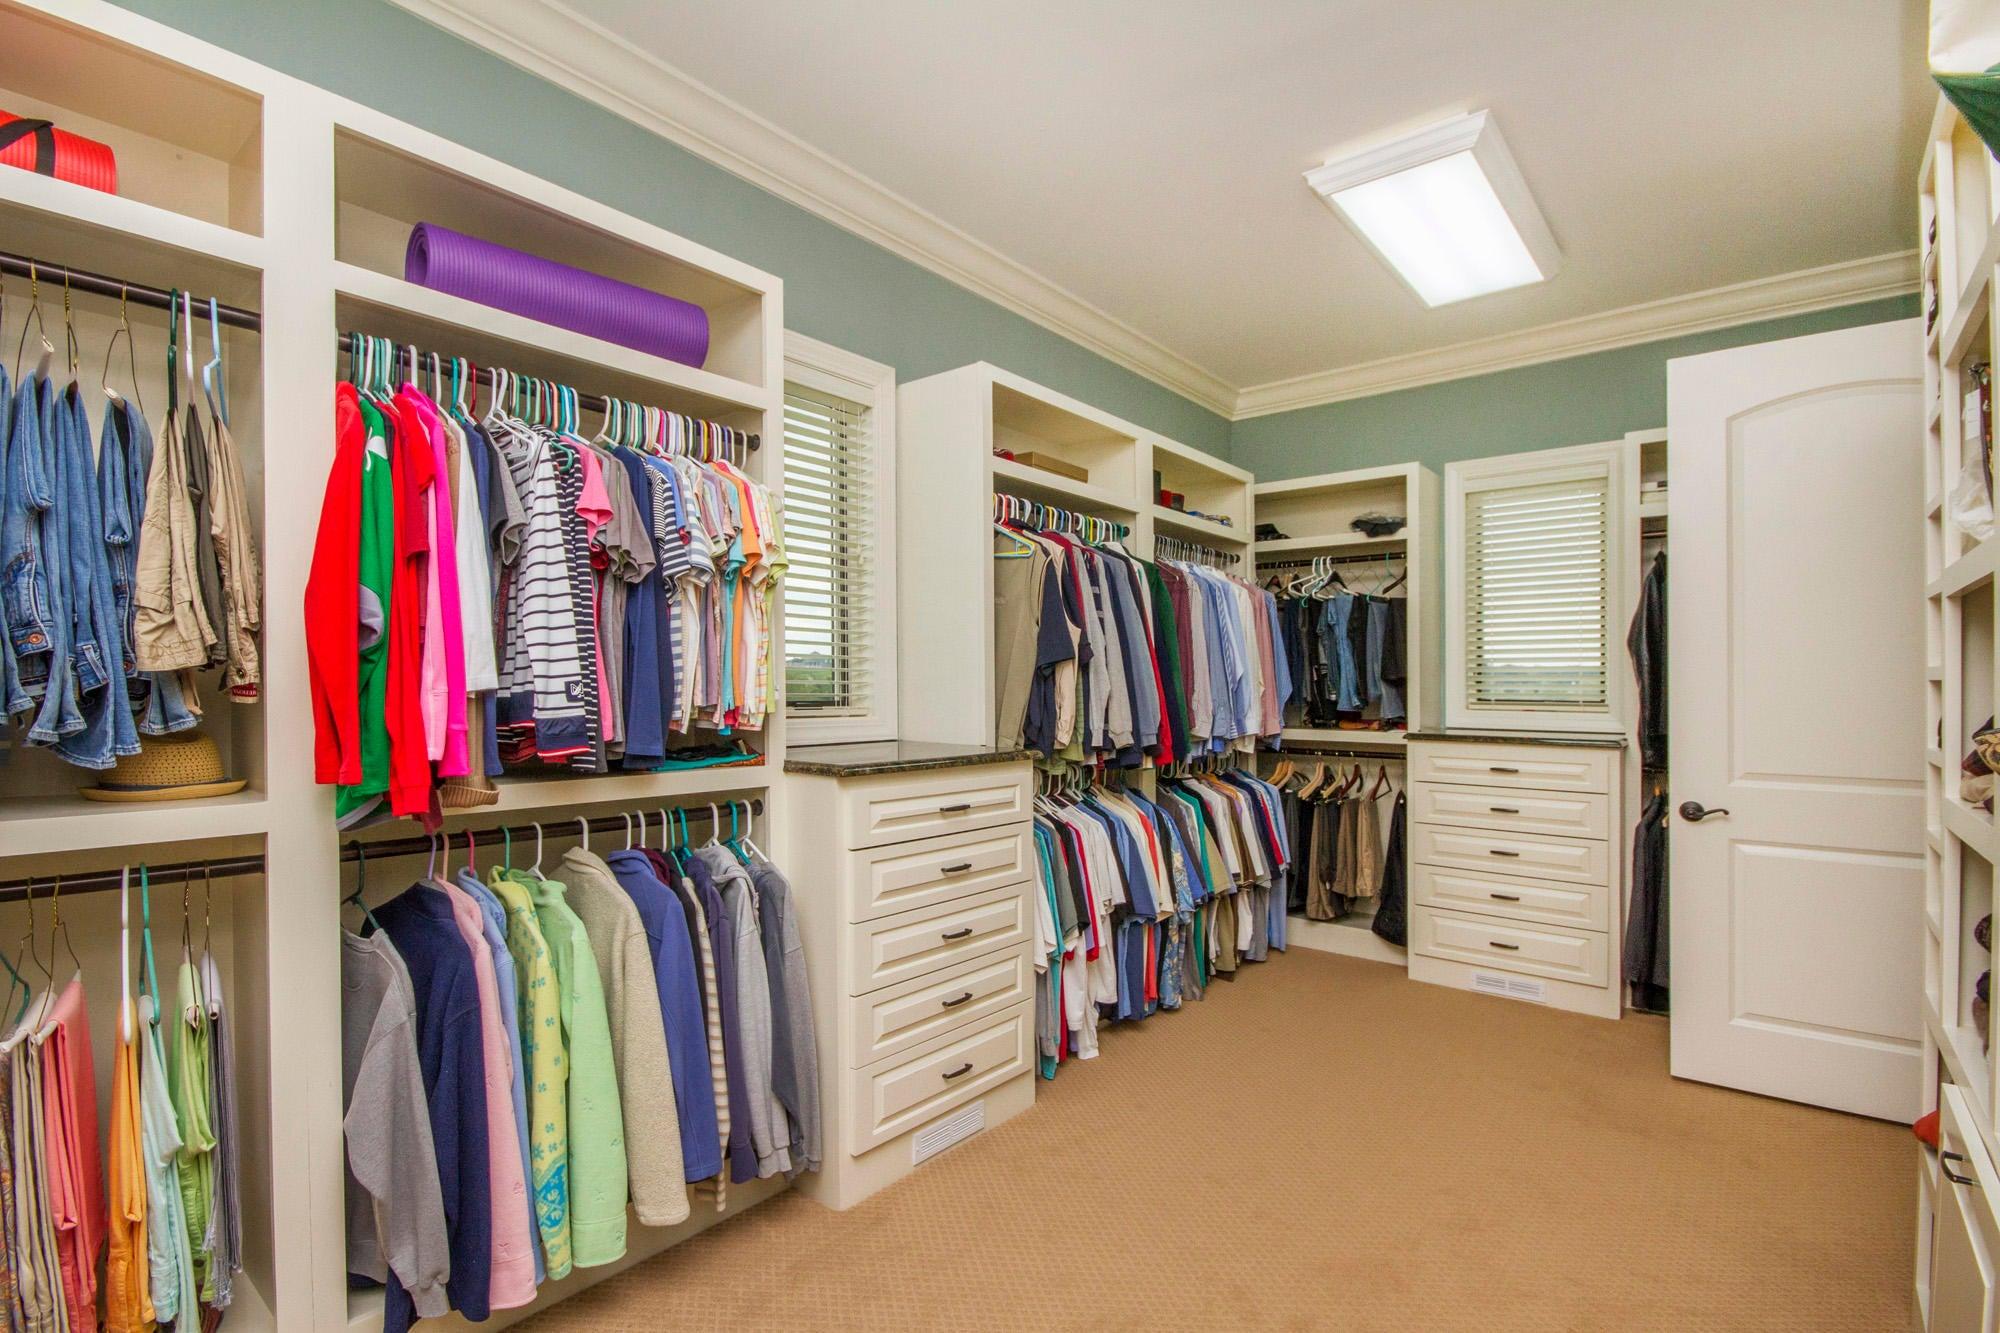 Huge, Organized & Bright Closet!